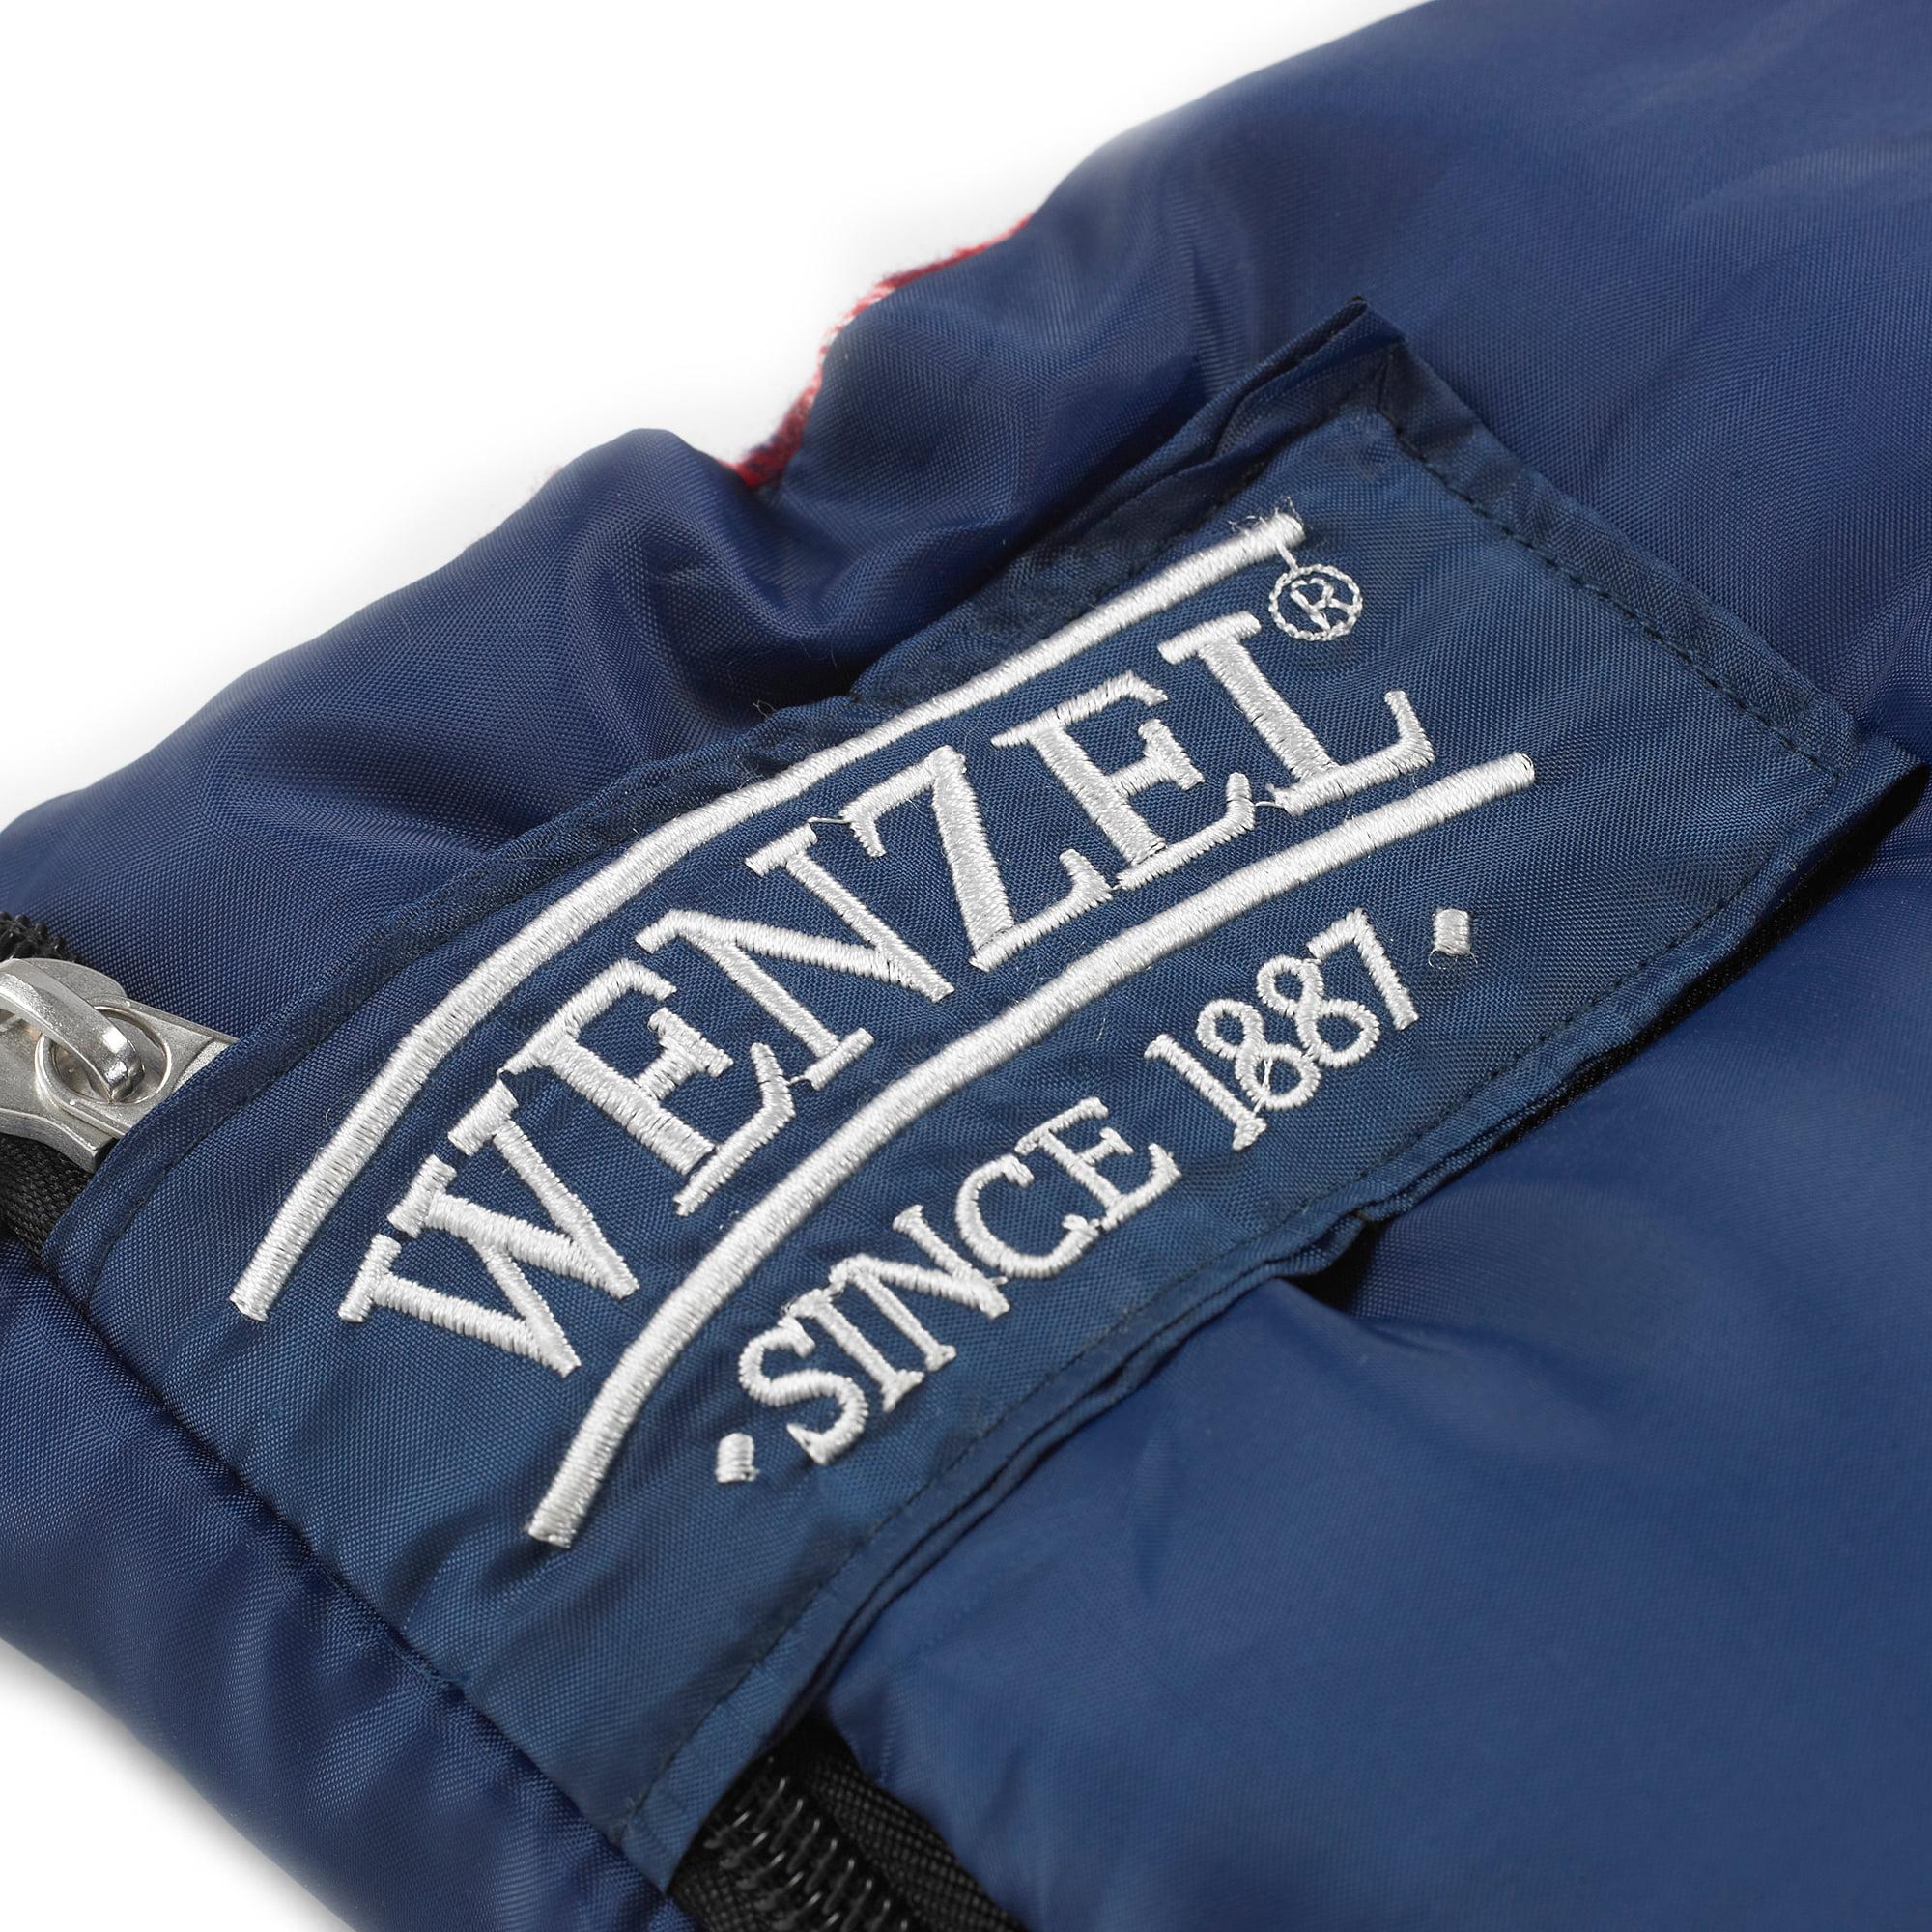 Wenzel Blue Jay 25 Degree Sleeping Bag